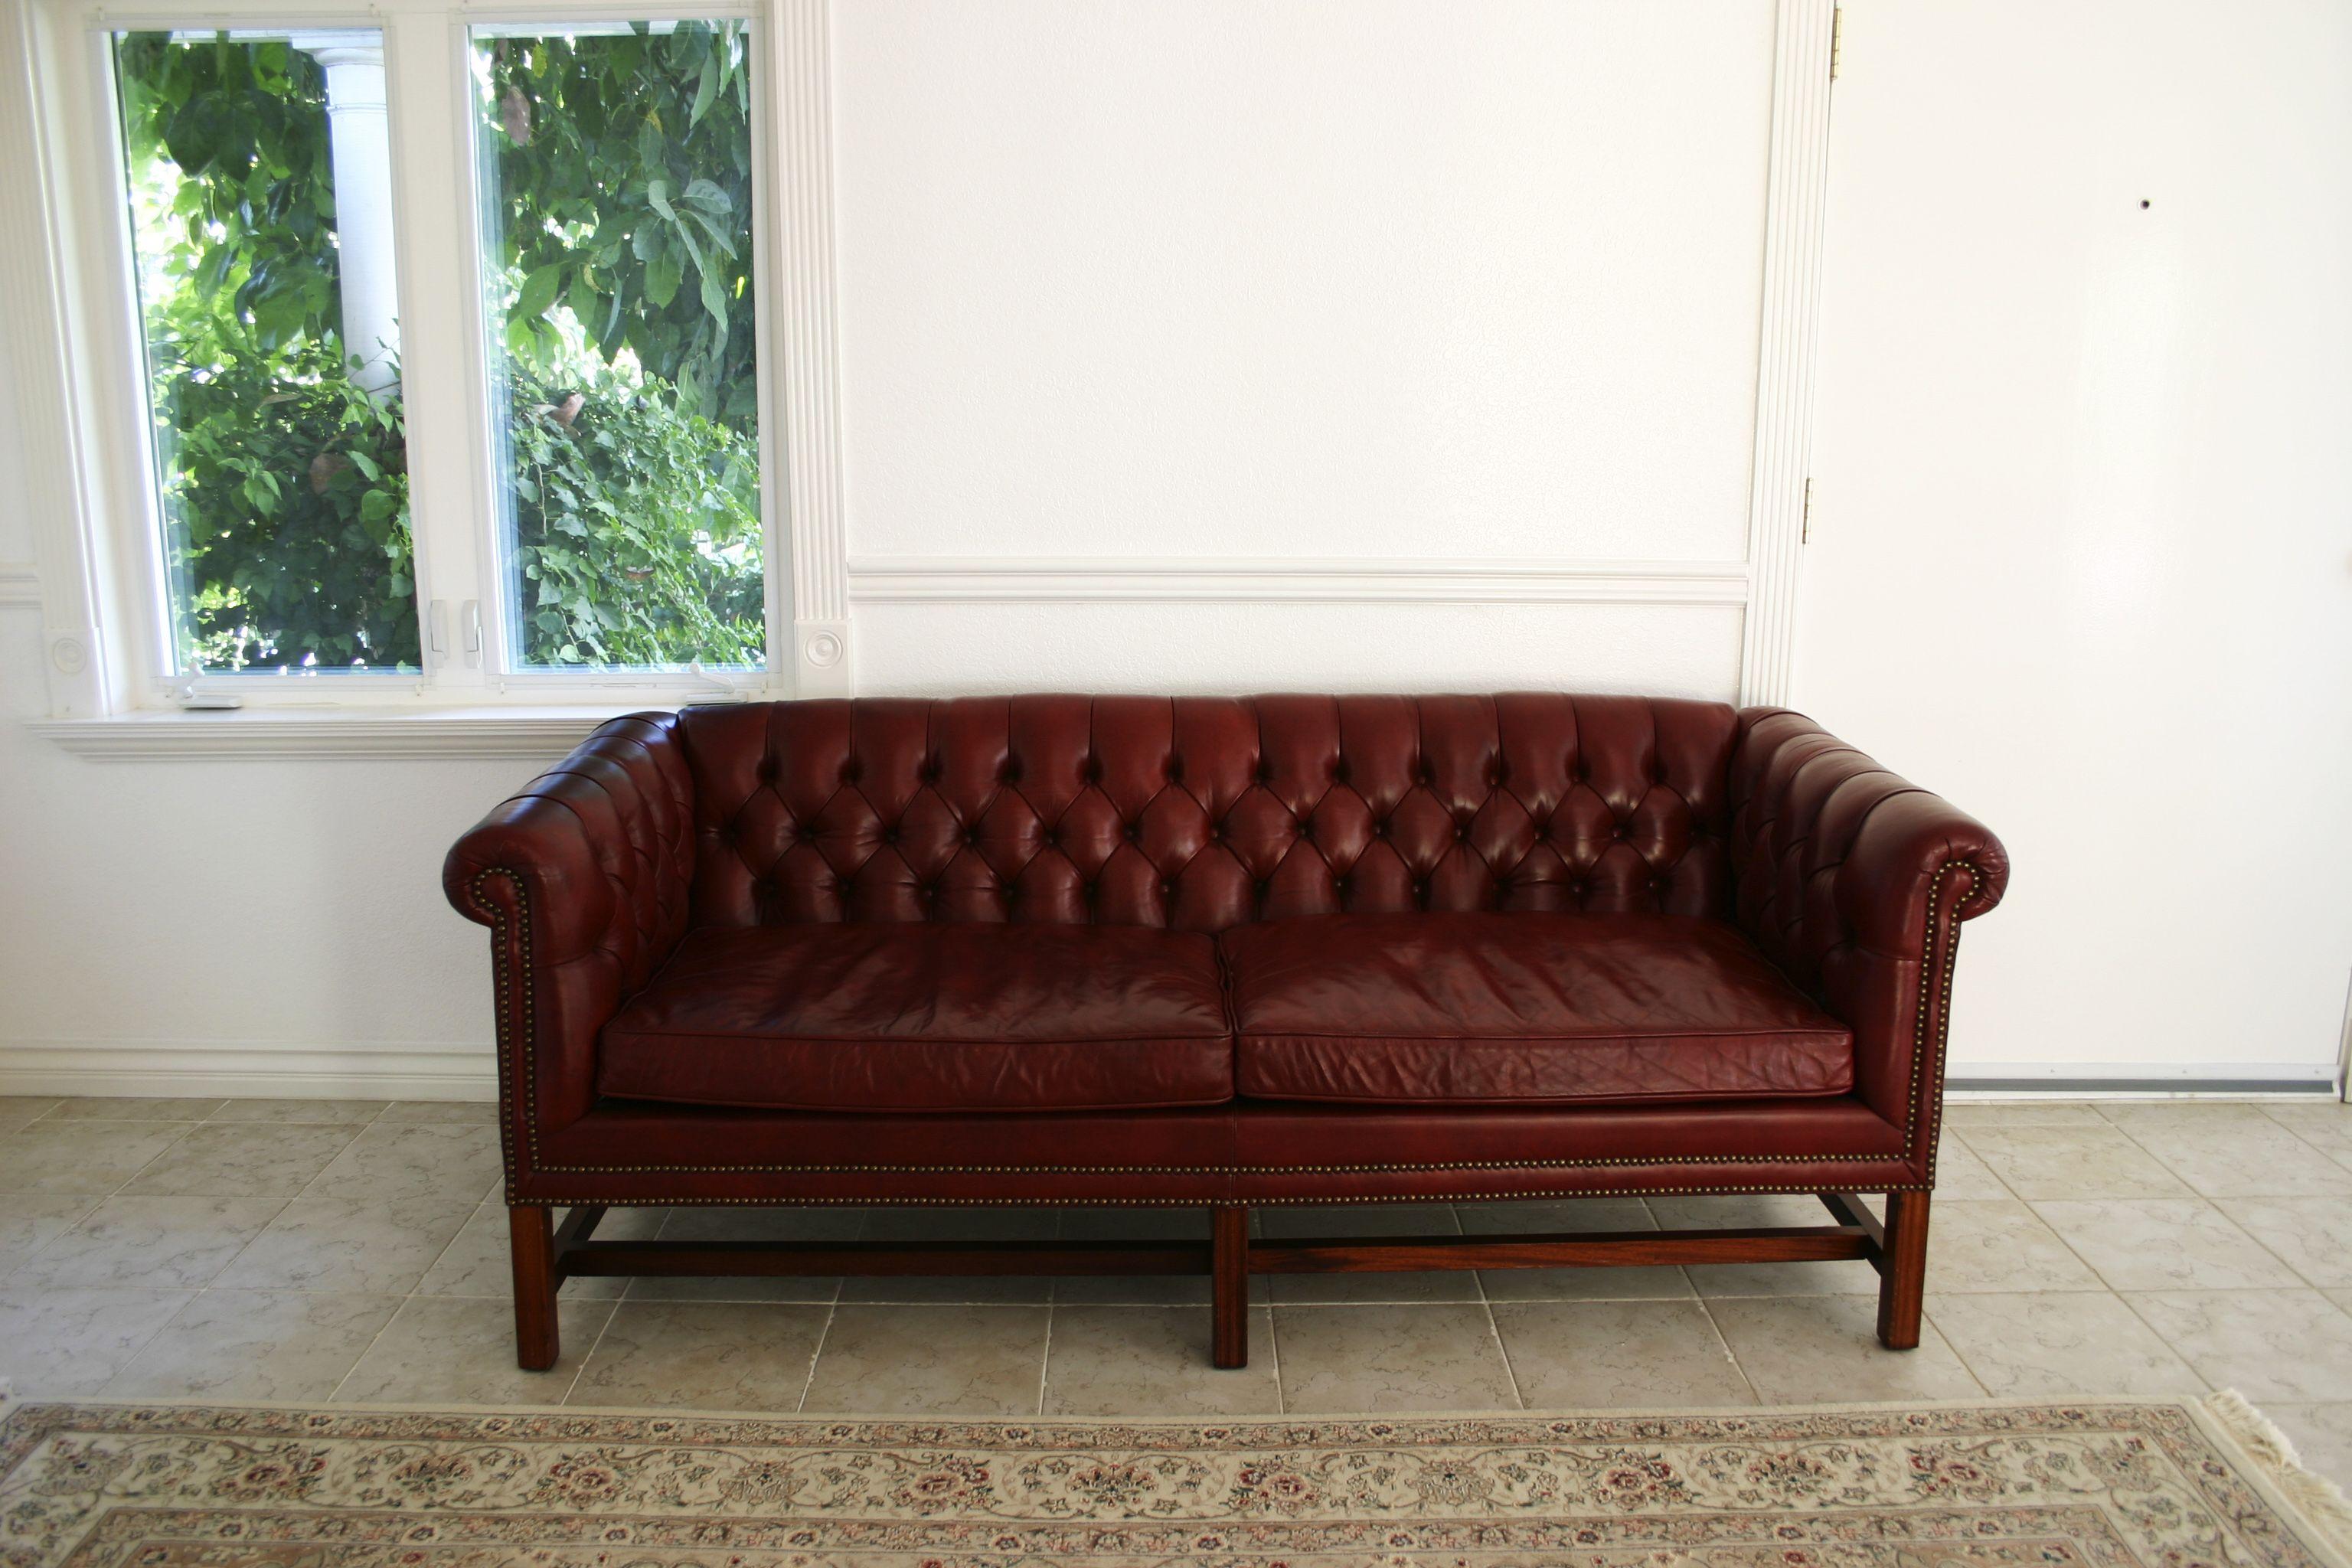 Sofa in coffee shop google search arquitetura pinterest